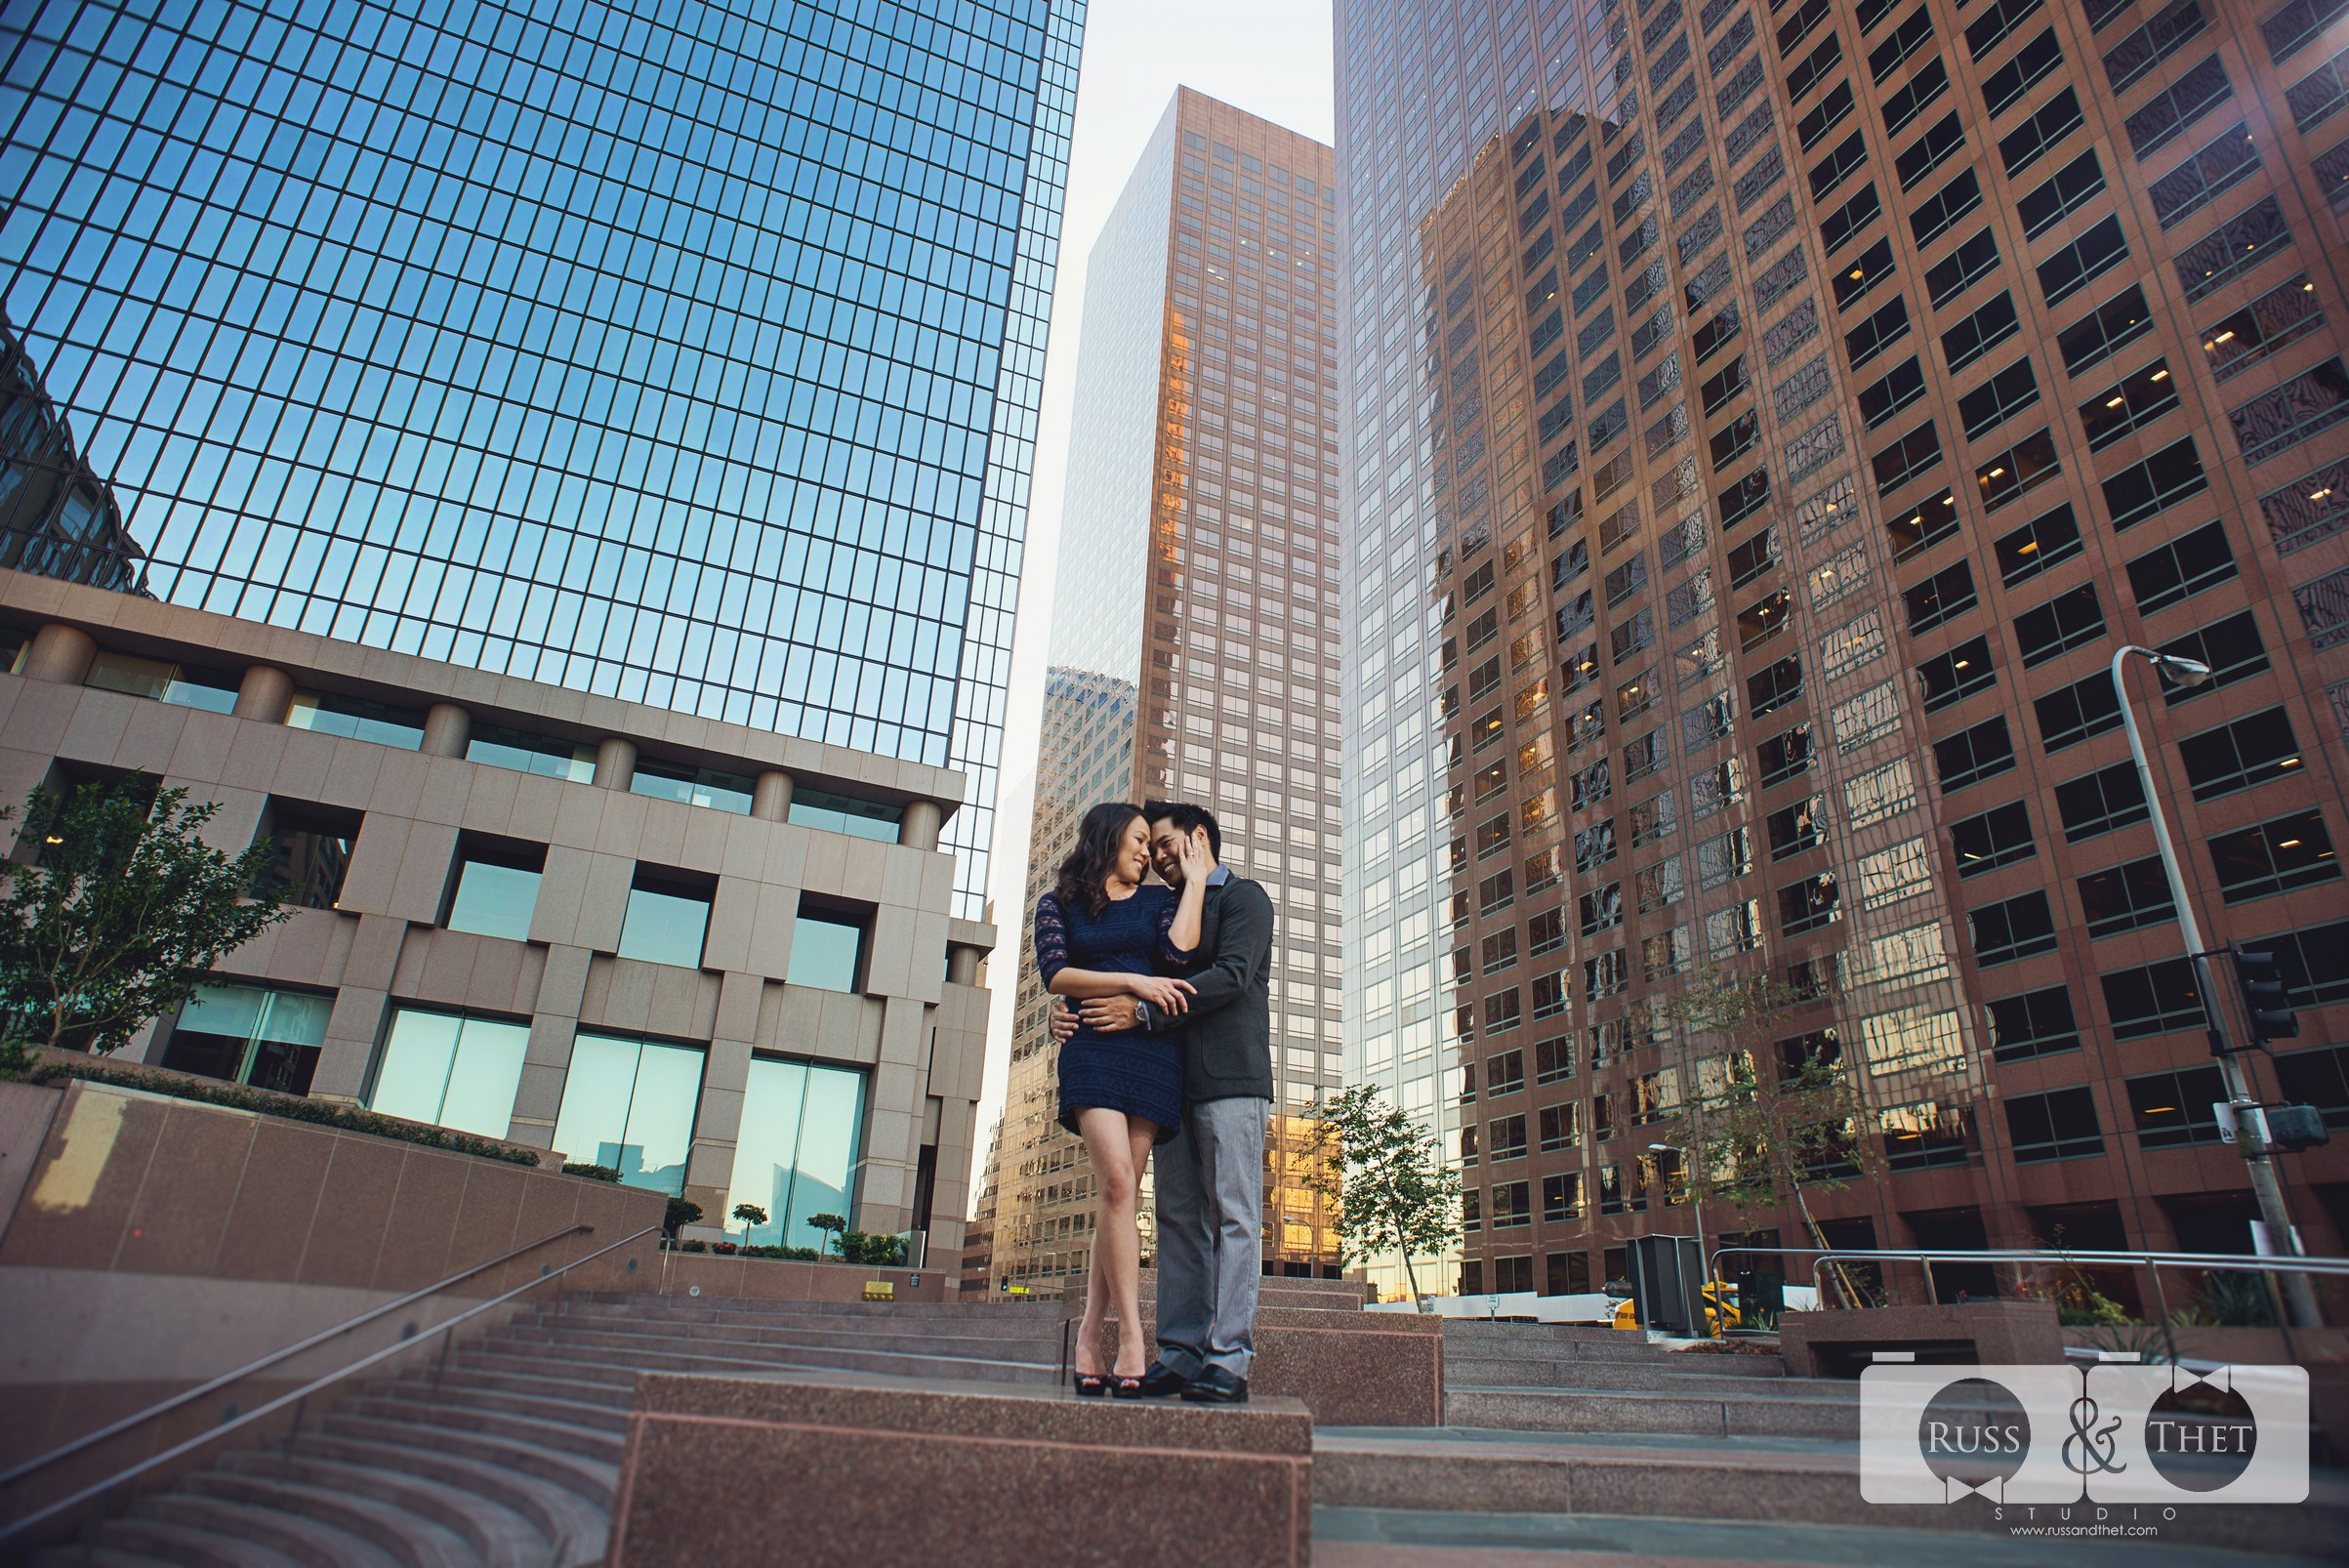 Emero_Lucinda_Downtown_Los_Angeles_Engagement_Photographer (17).jpg